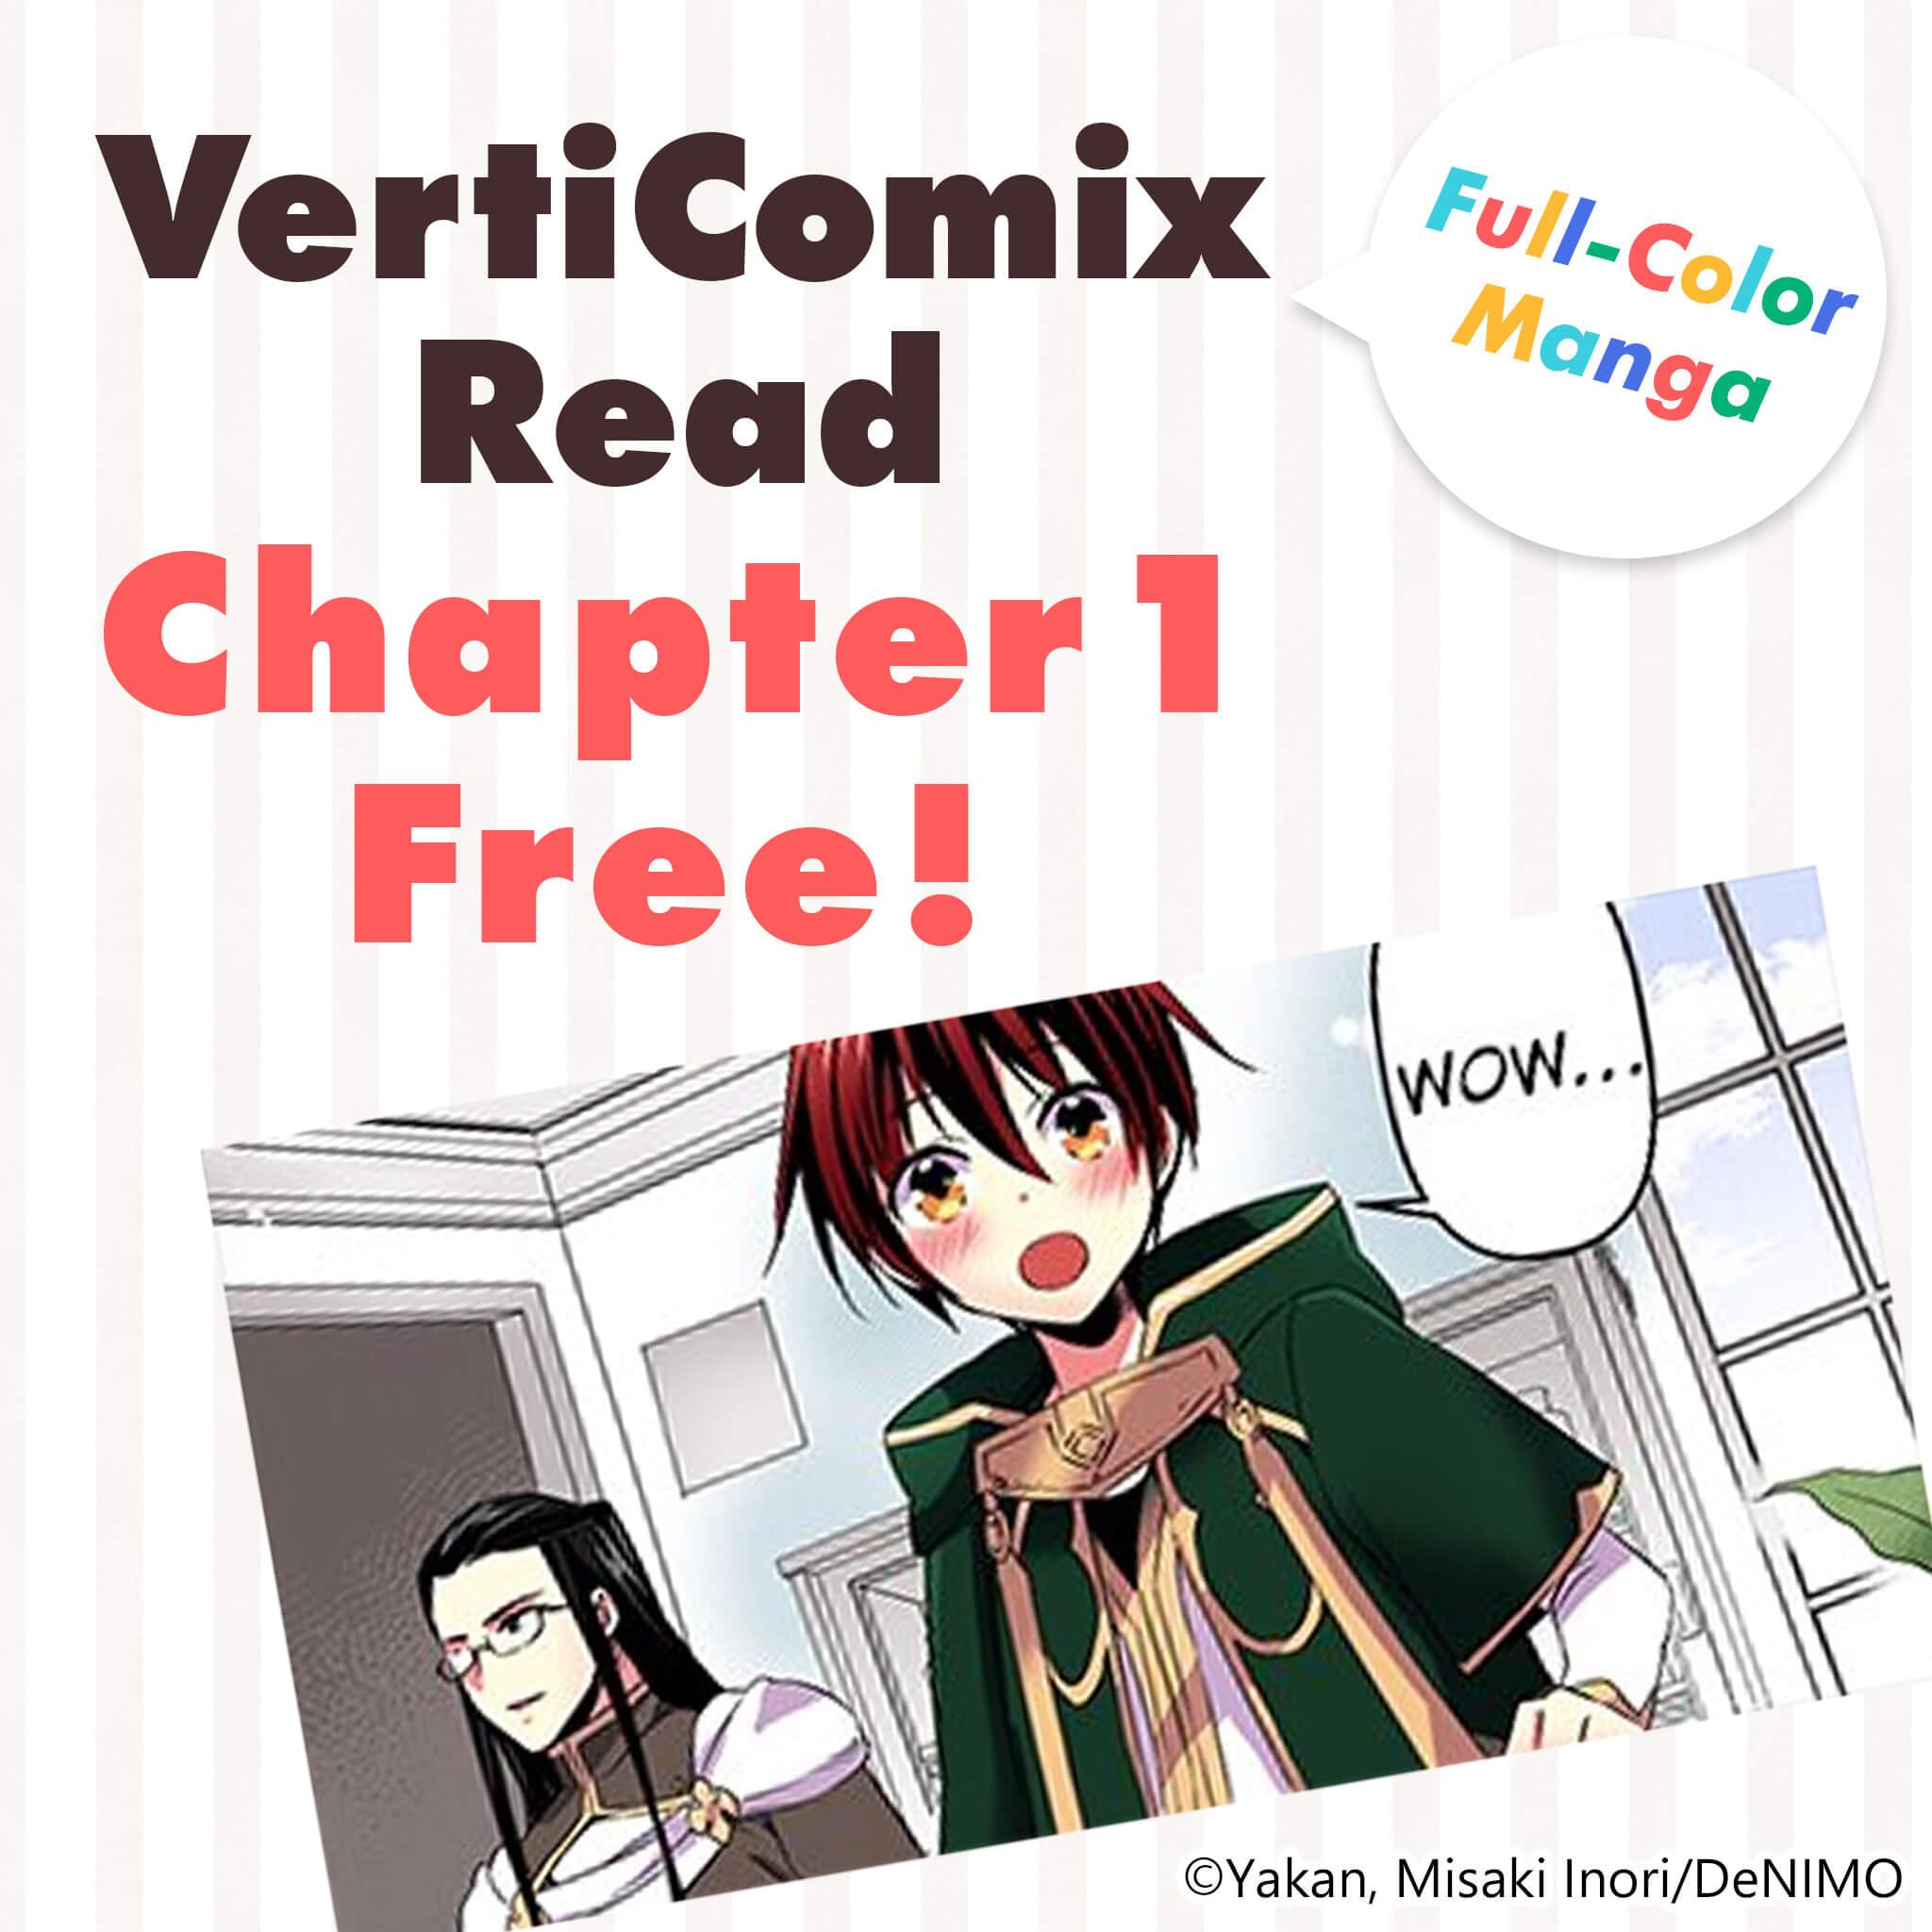 VertiComix (Full-Color Manga) Read Chapter 1 Free!